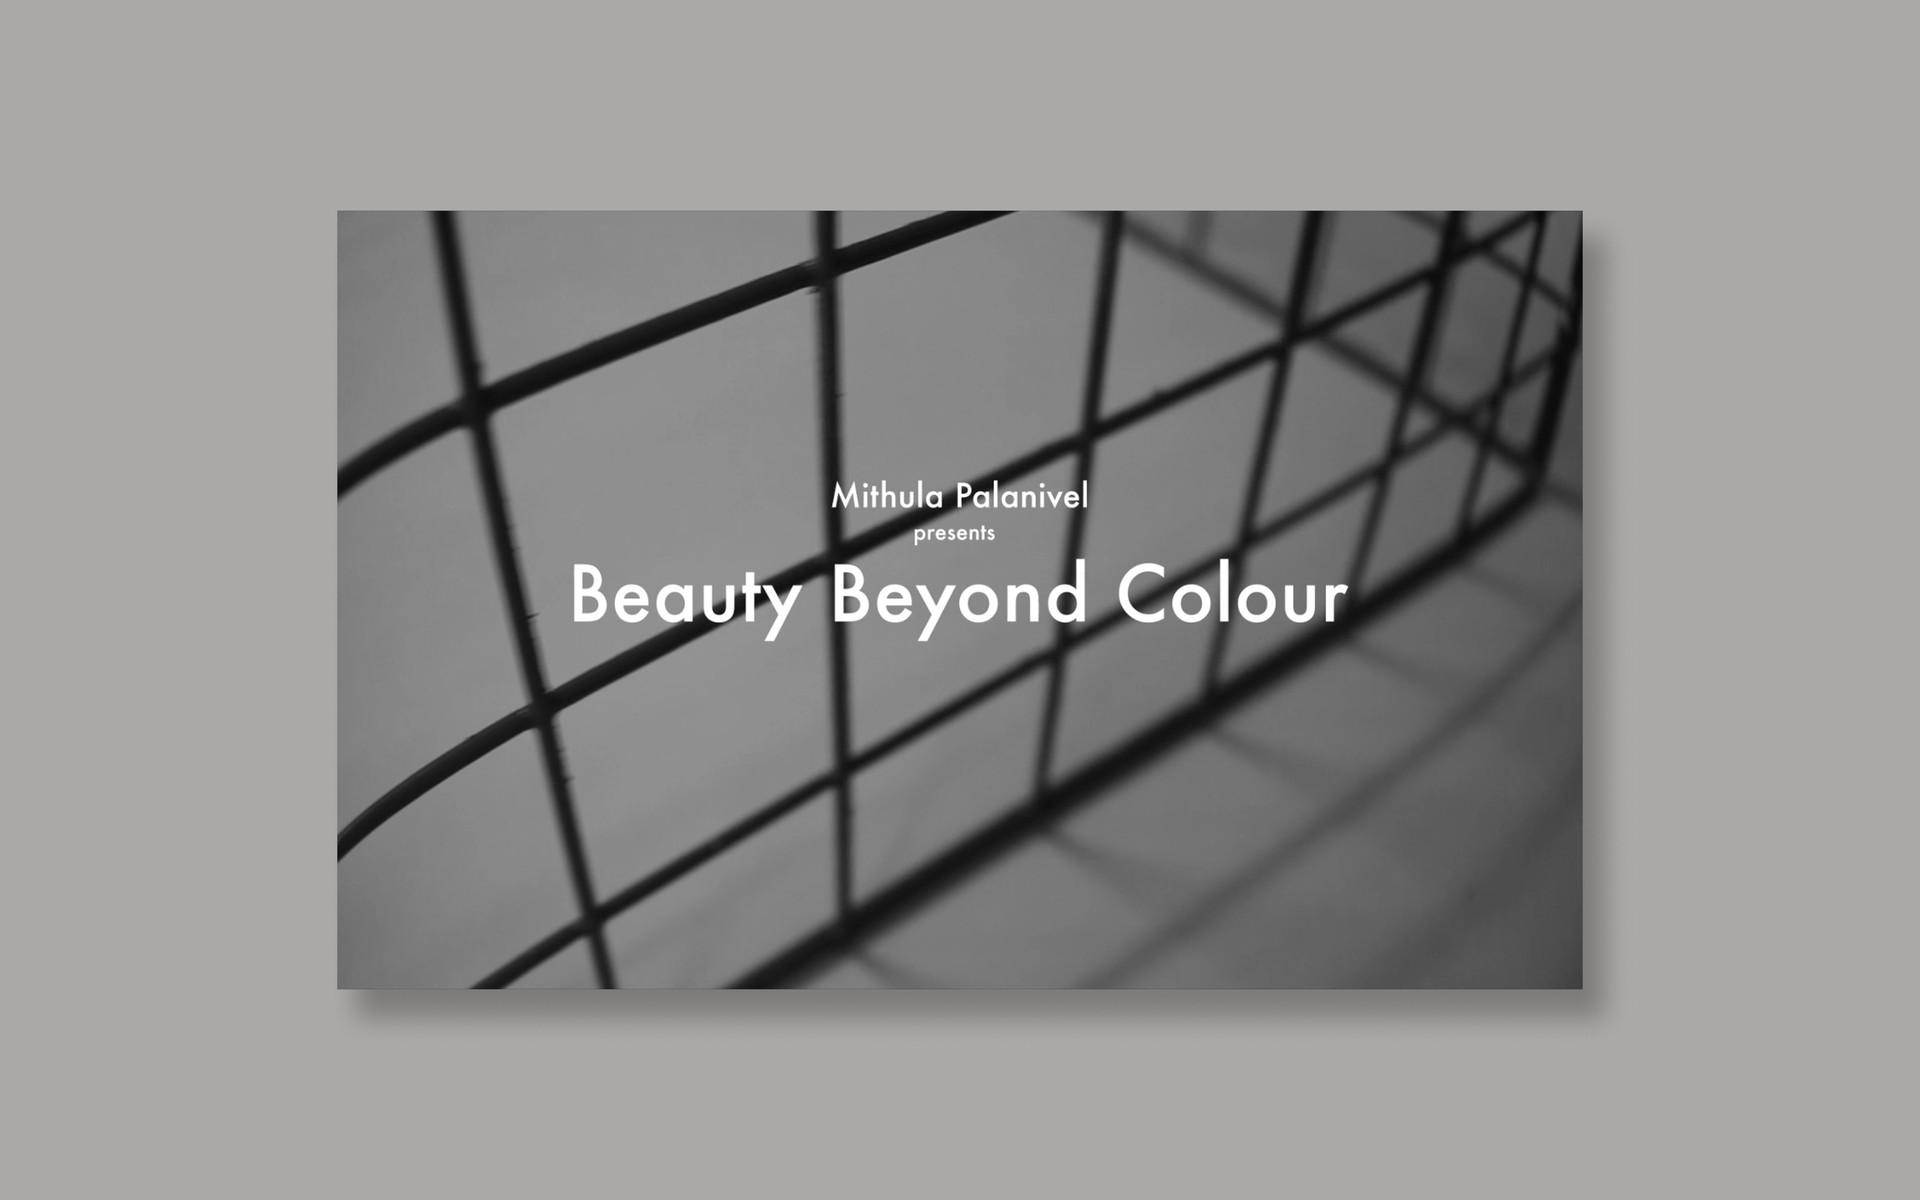 Beauty Beyond Colour